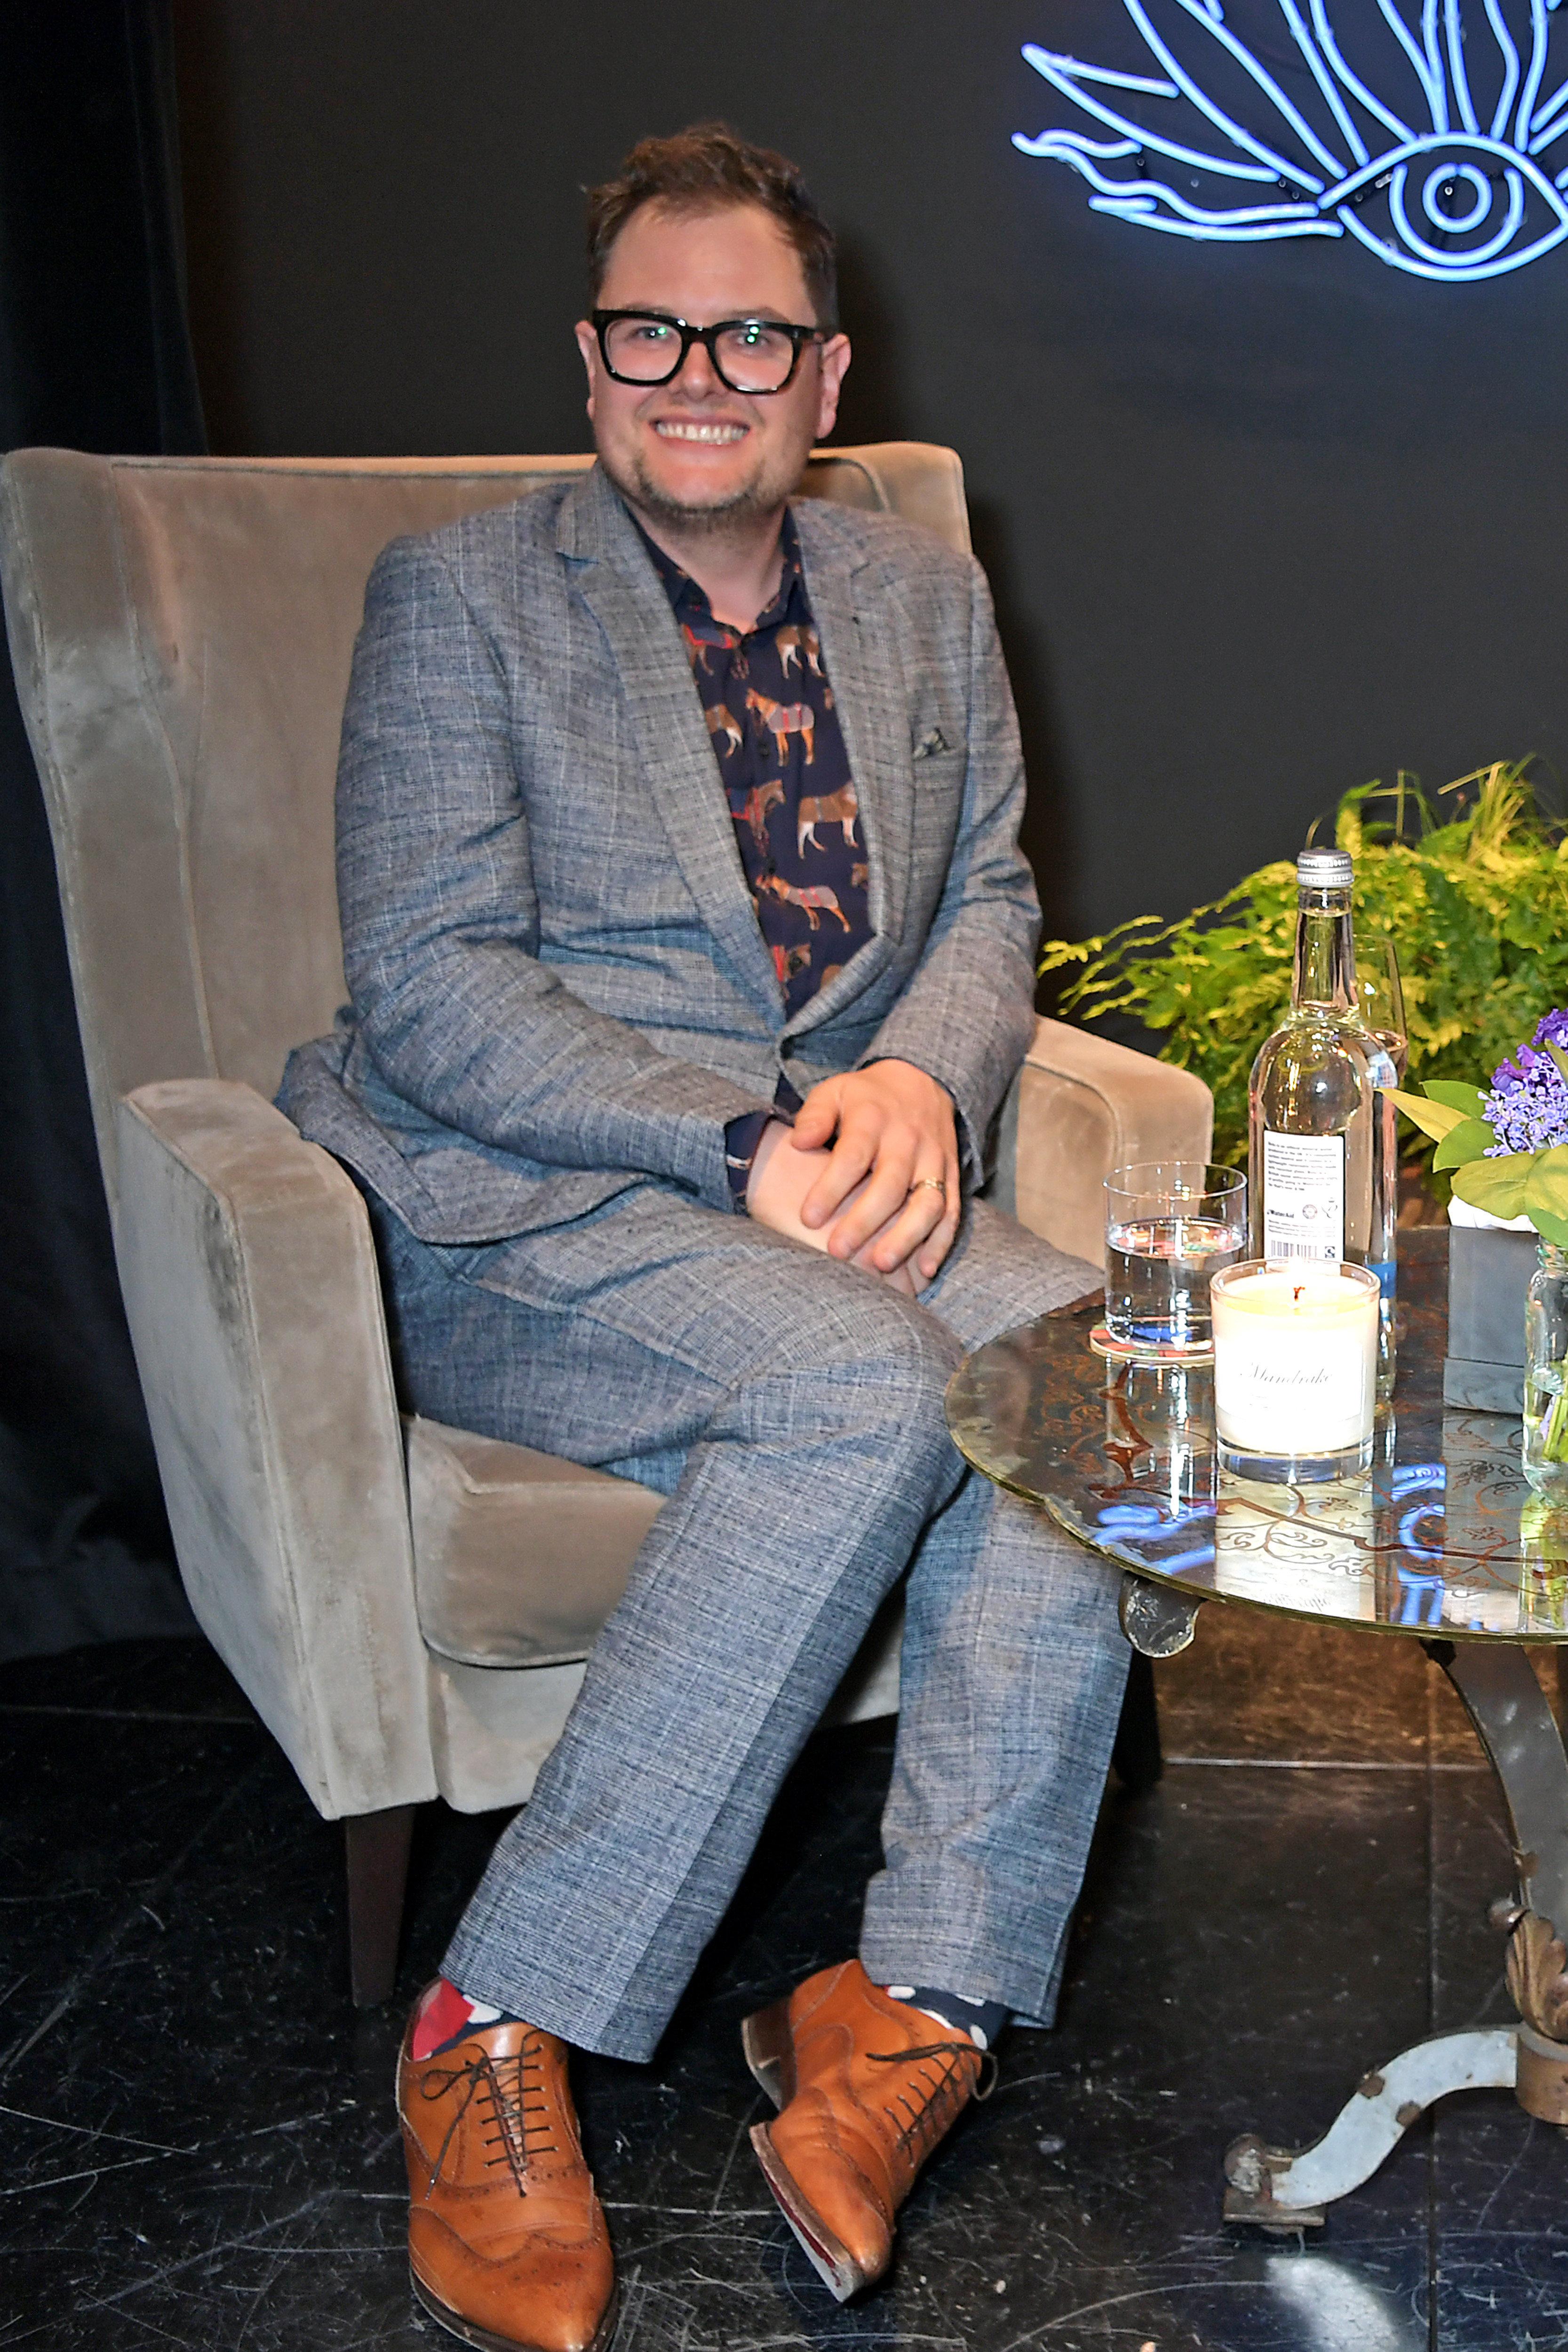 Alan Carr Backtracks After Claiming Paul O'Grady Would Join Him On RuPaul's Drag Race